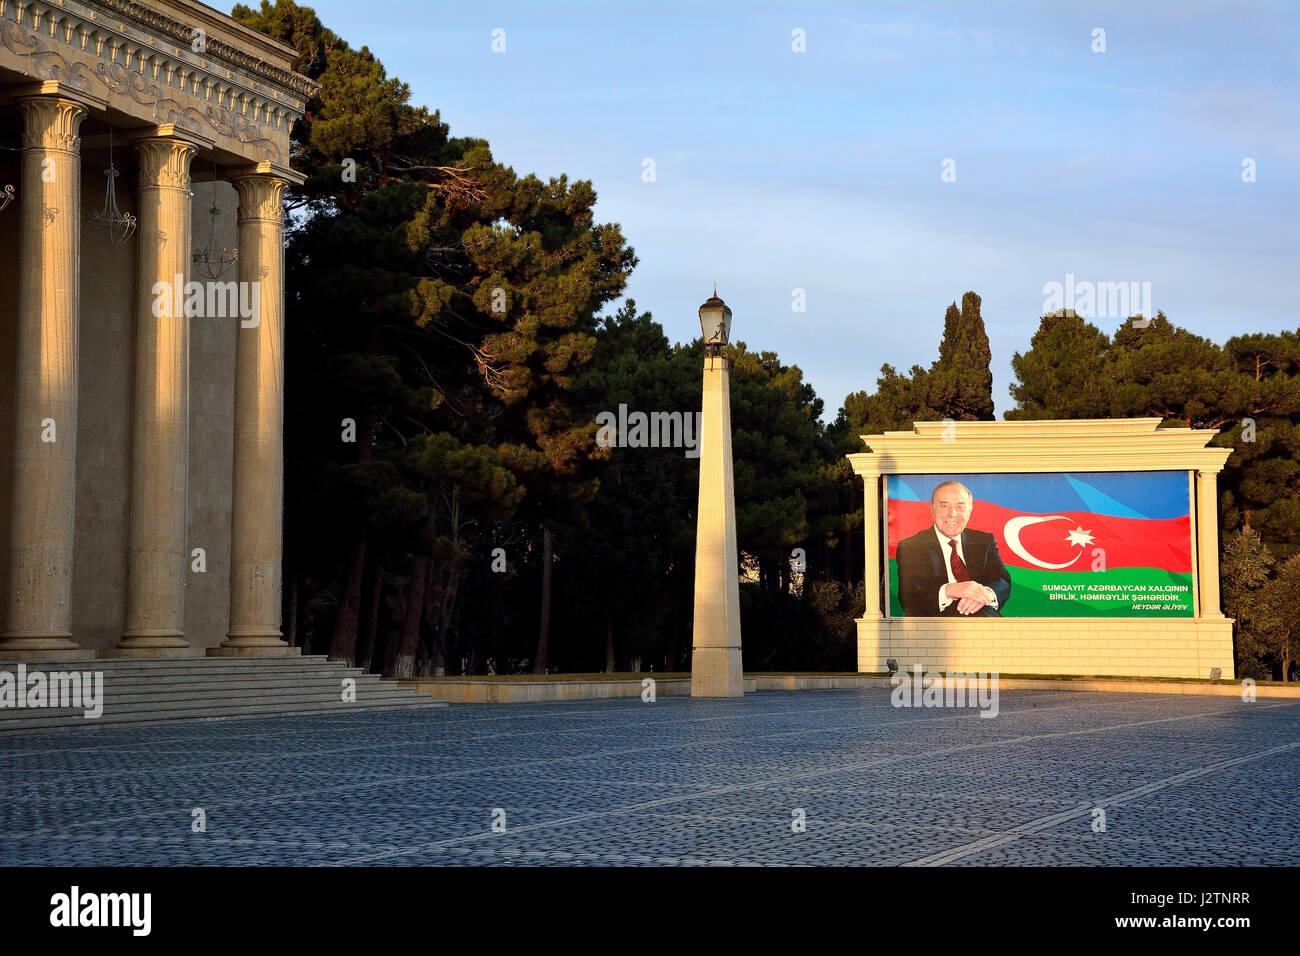 Heydar Aliyev in front of Azerbaijani flag on poster. Photograph of former President of Azerbaijan displayed in Stock Photo